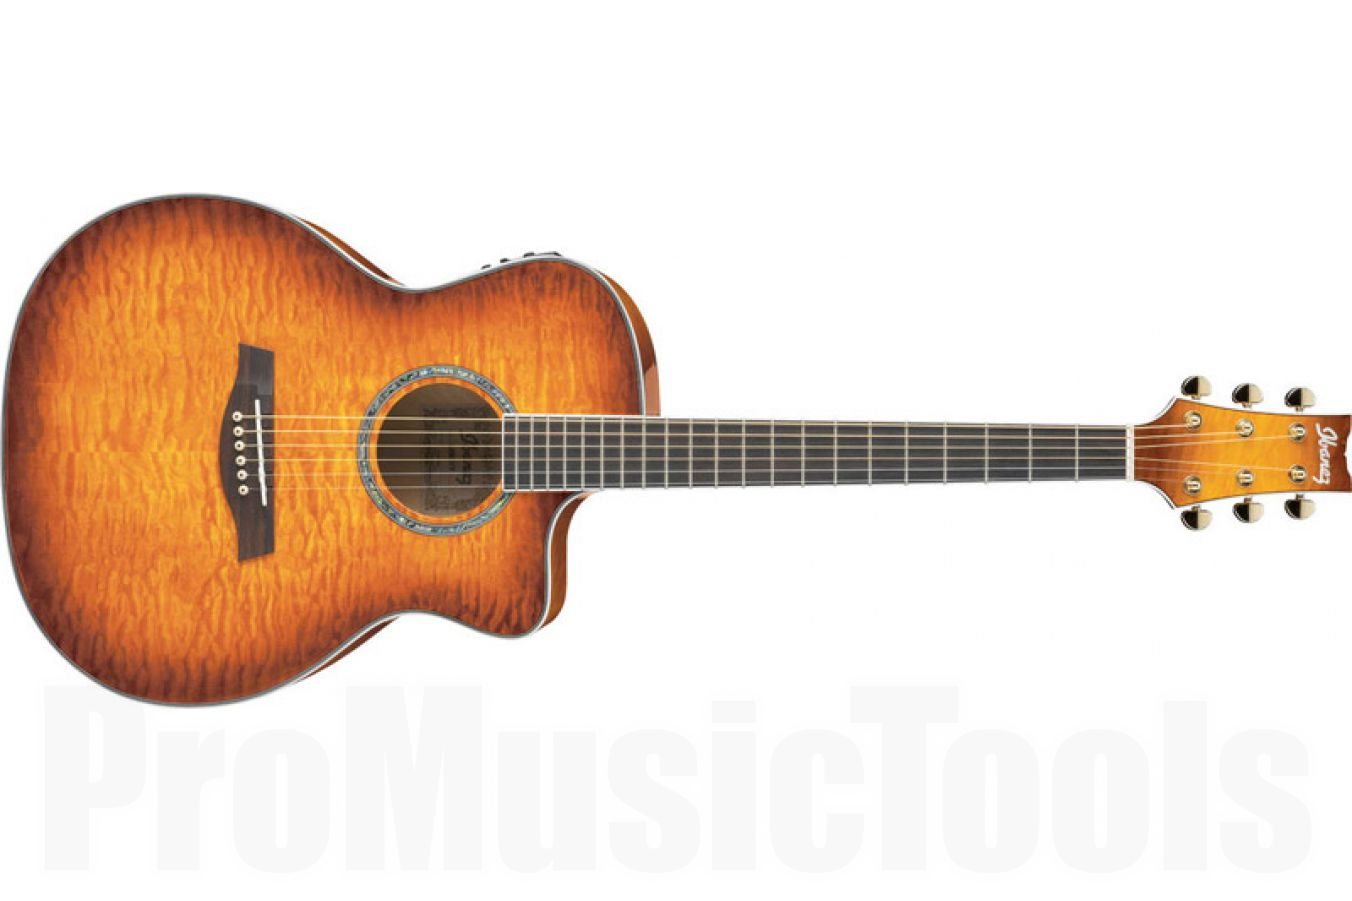 Ibanez A300E VV - Vintage Violin